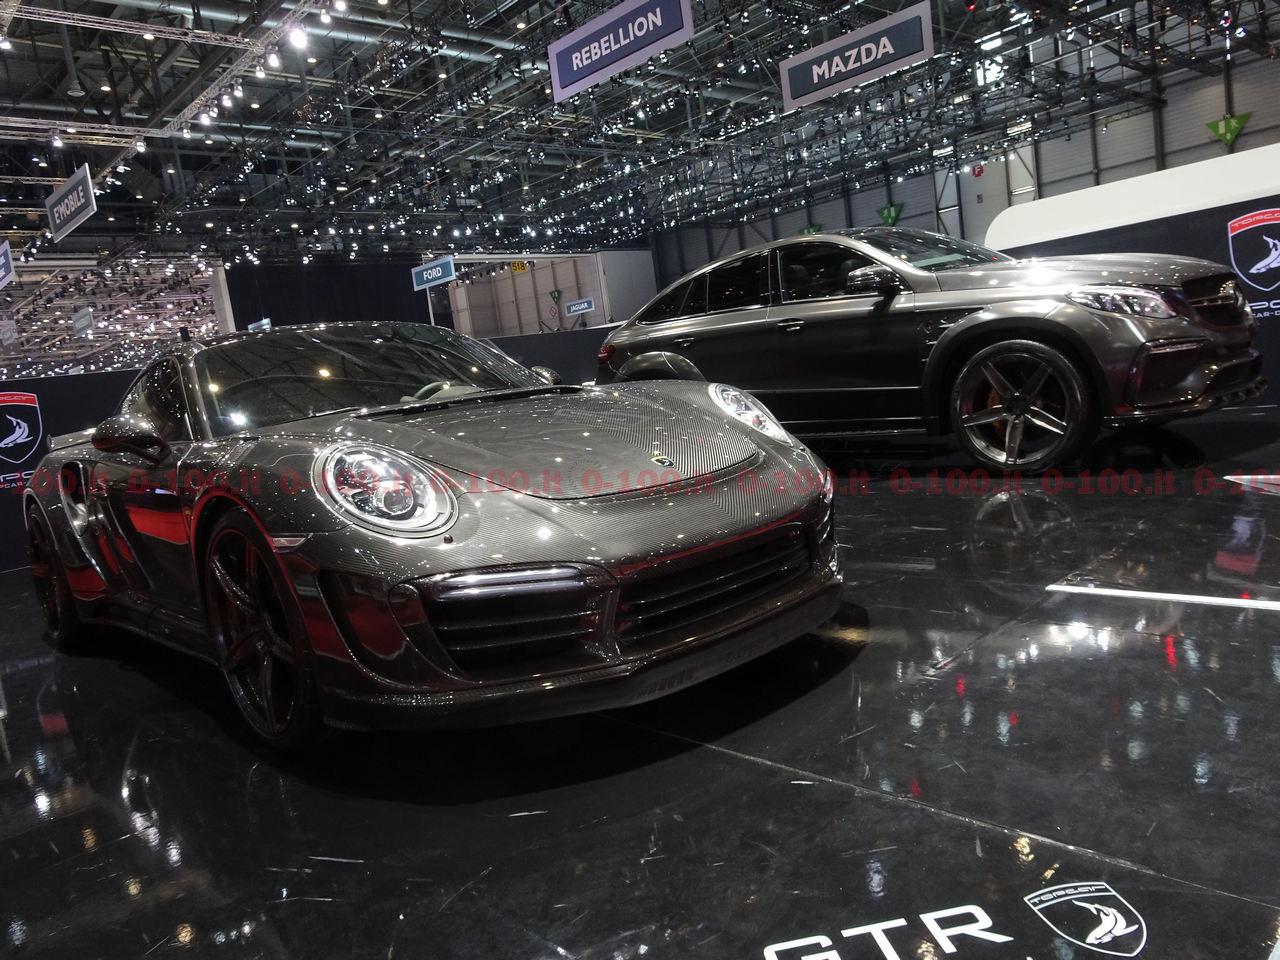 Geneve-ginevra-geneva-2017_tuning-top-car-porsche-991-2-gtr_0-100_1